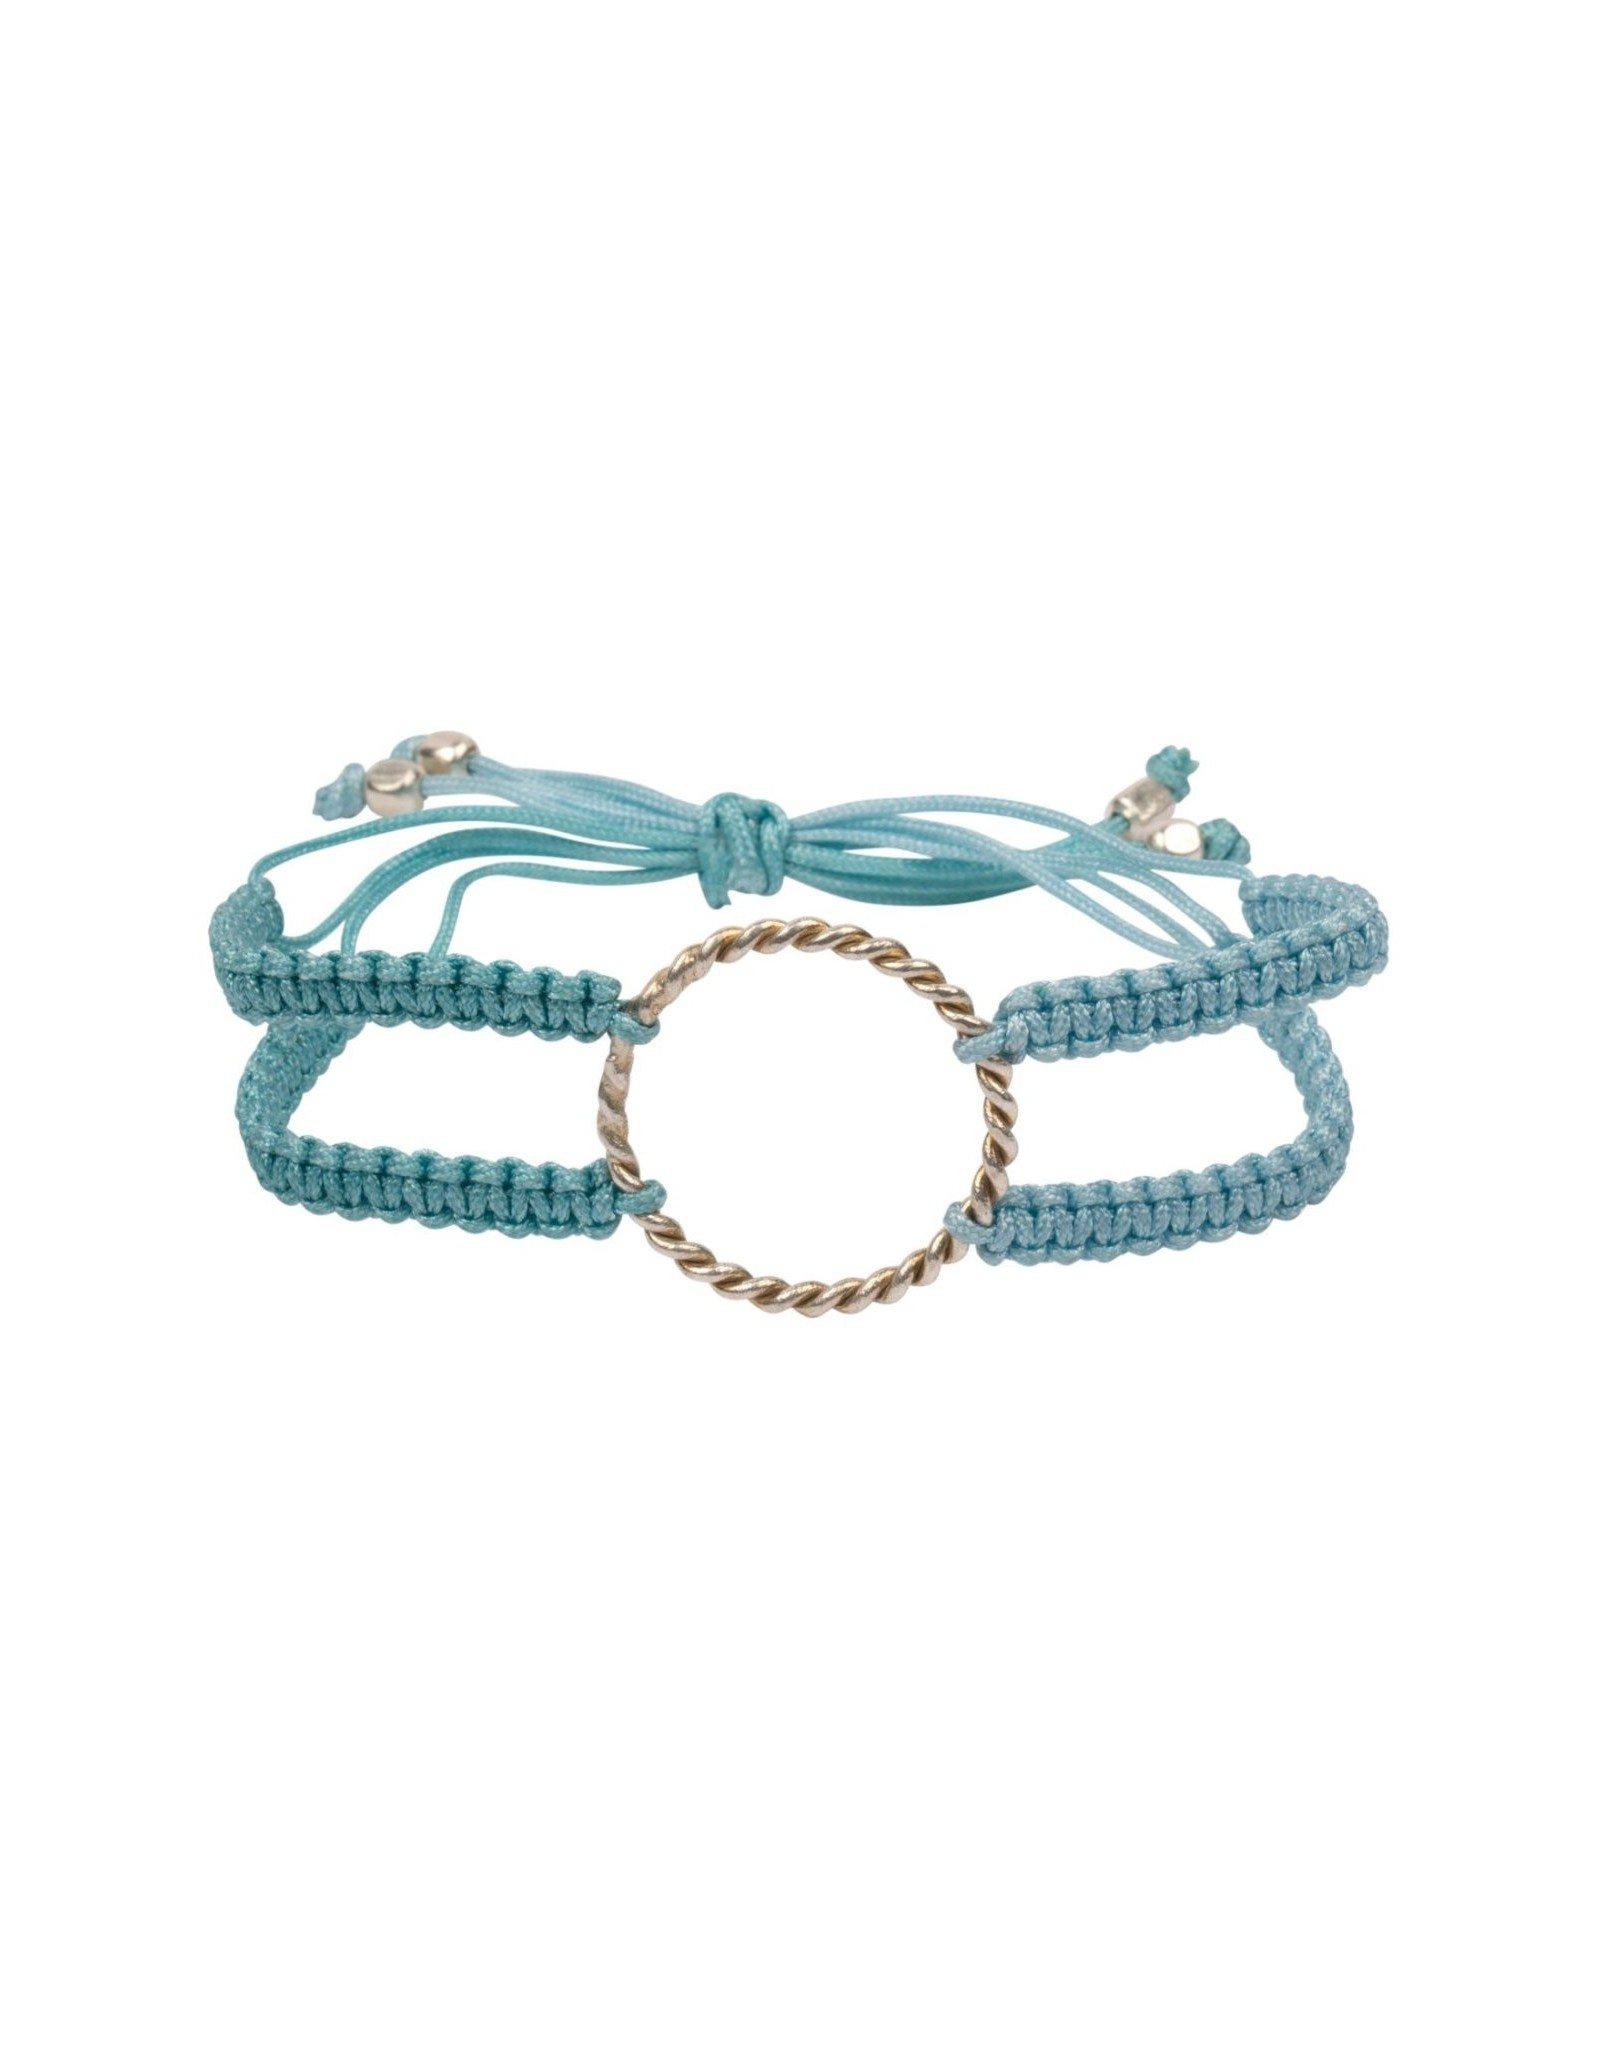 Macrame Bracelet with Ring Friends Forever